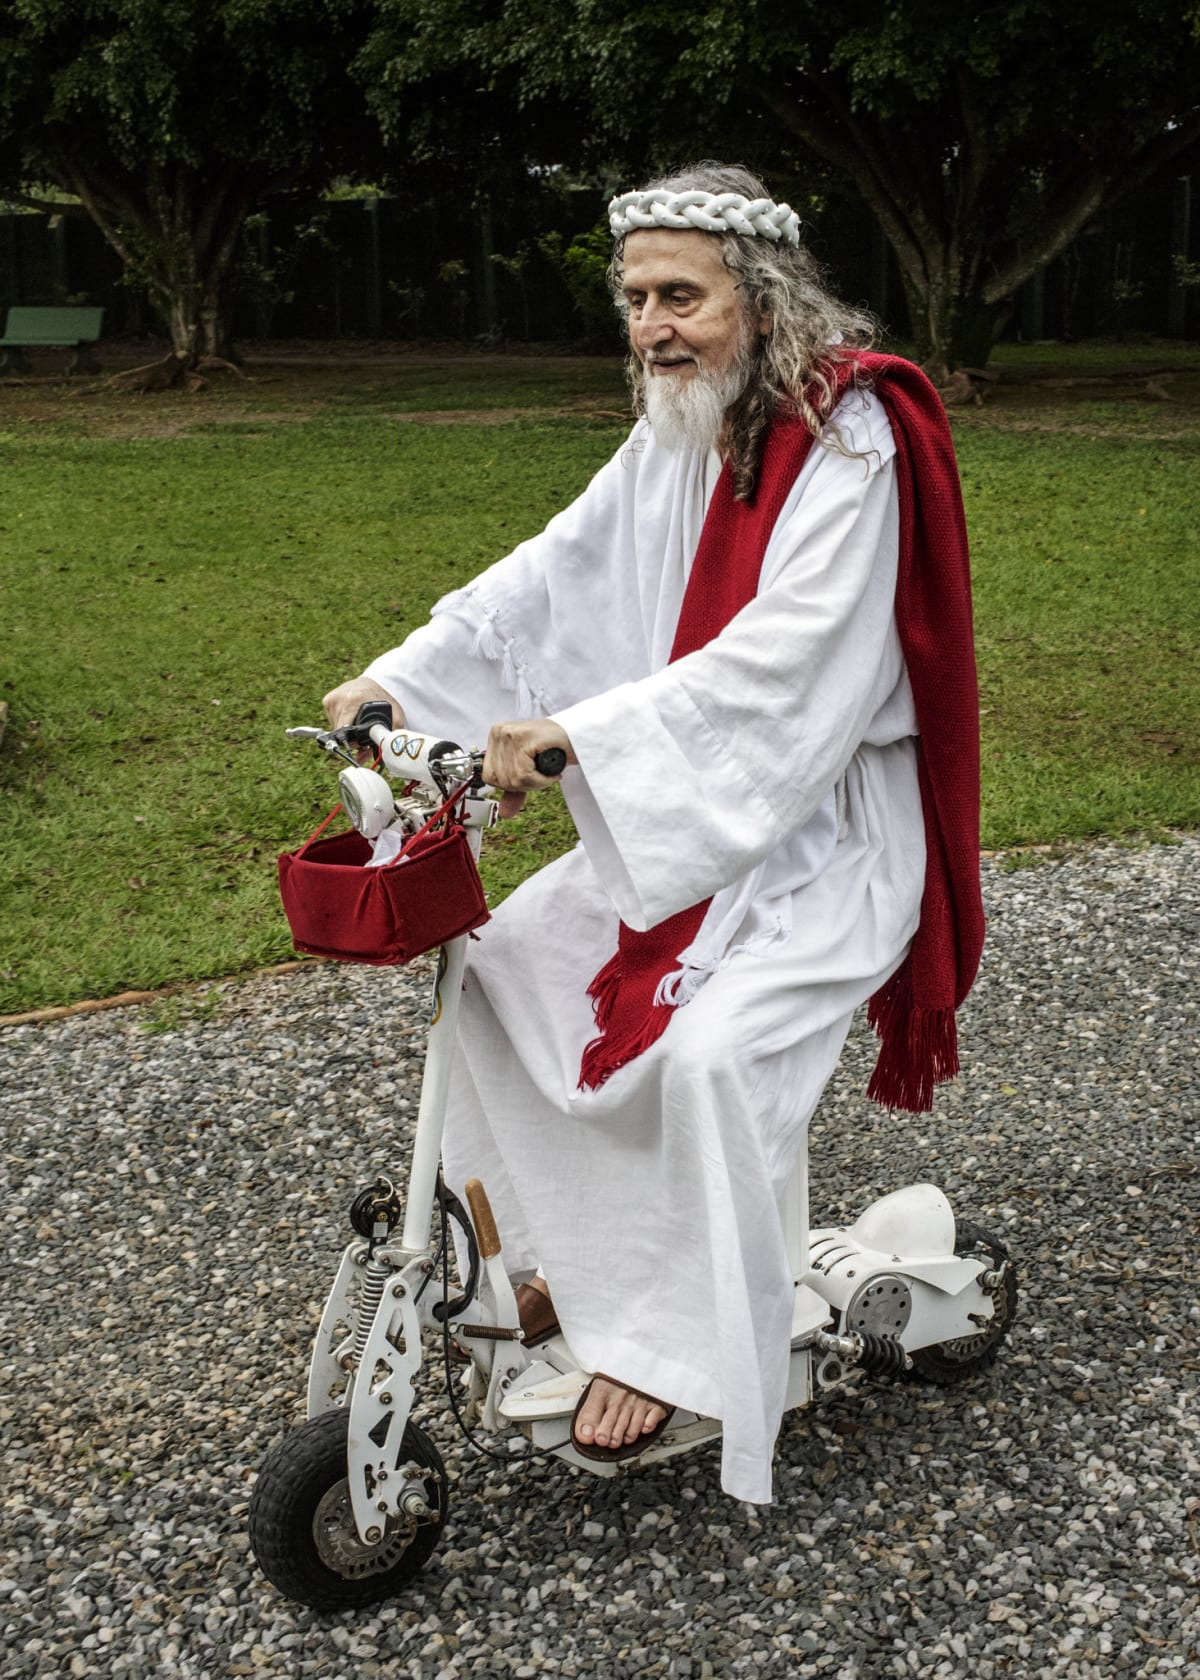 Jonas Bendiksen, INRI Cristo on electrical bike, Brazil, 2014